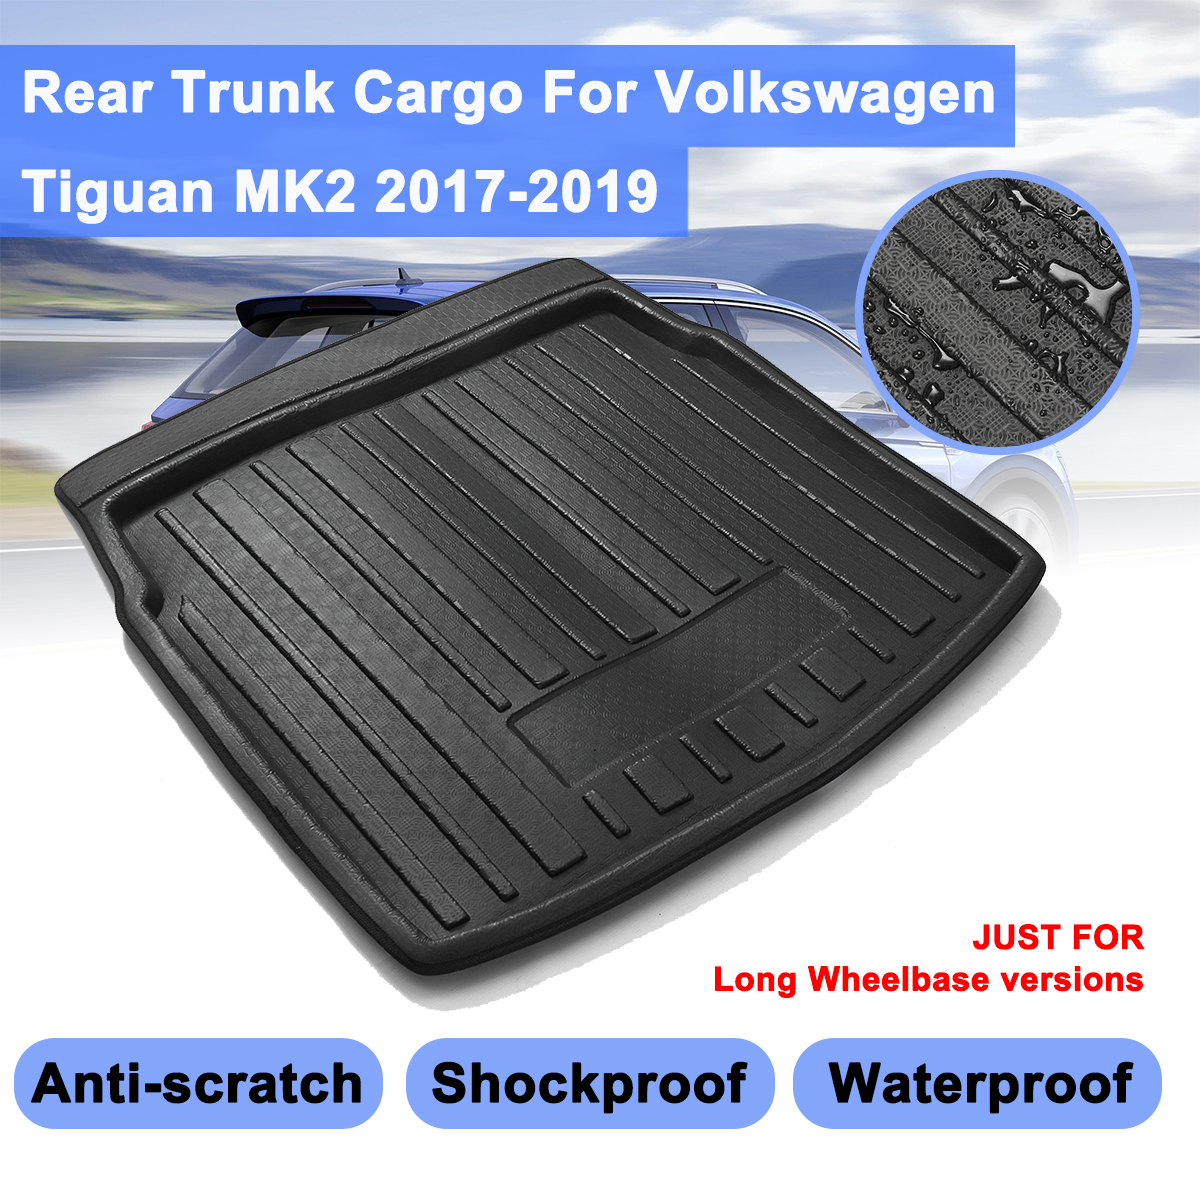 Car Cargo Liner Boot Tray For VW Tiguan MK2 For Volkswagen2017 2018 2019 Rear Trunk Cover Matt Mat Floor Carpet Kick Pad